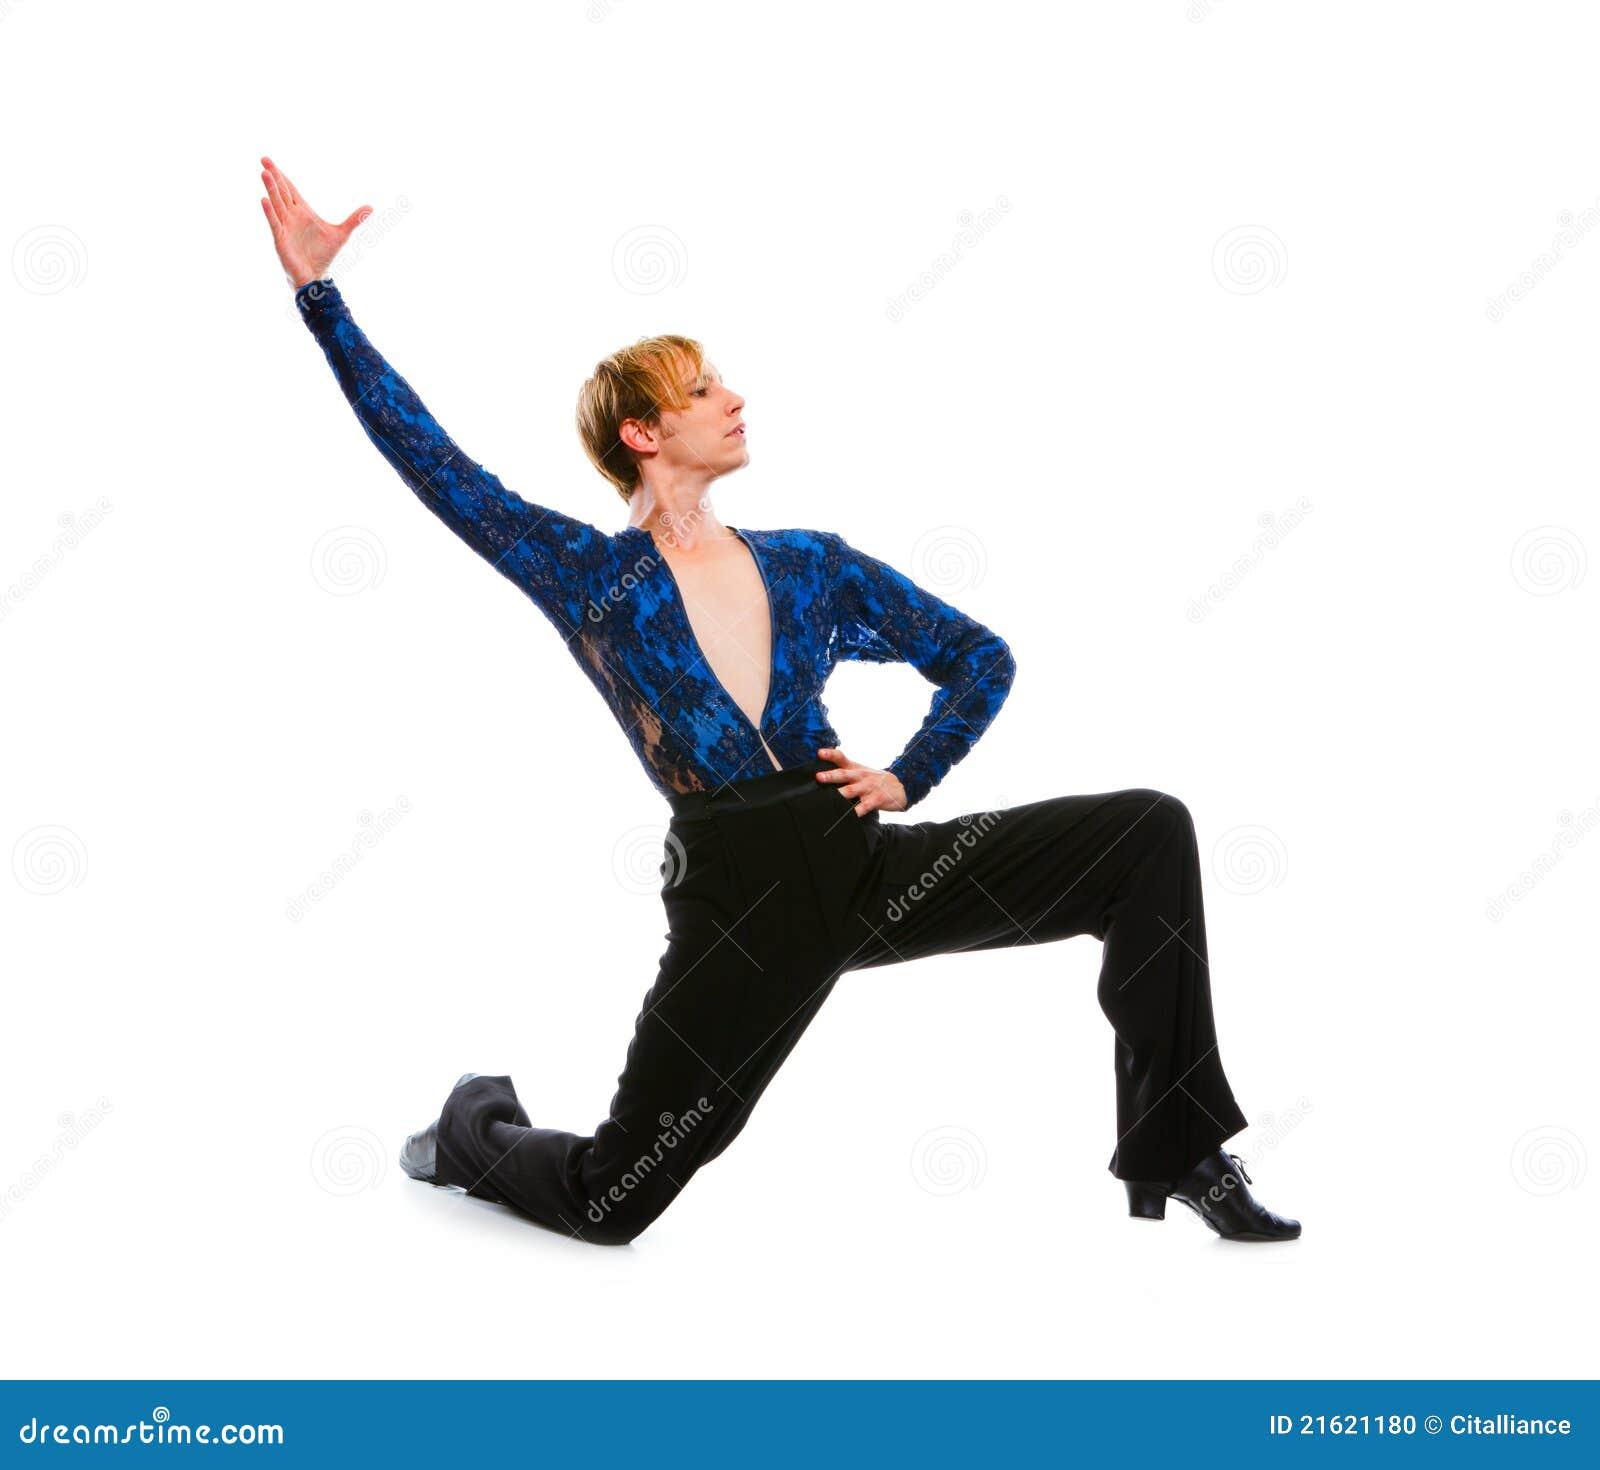 male dancing